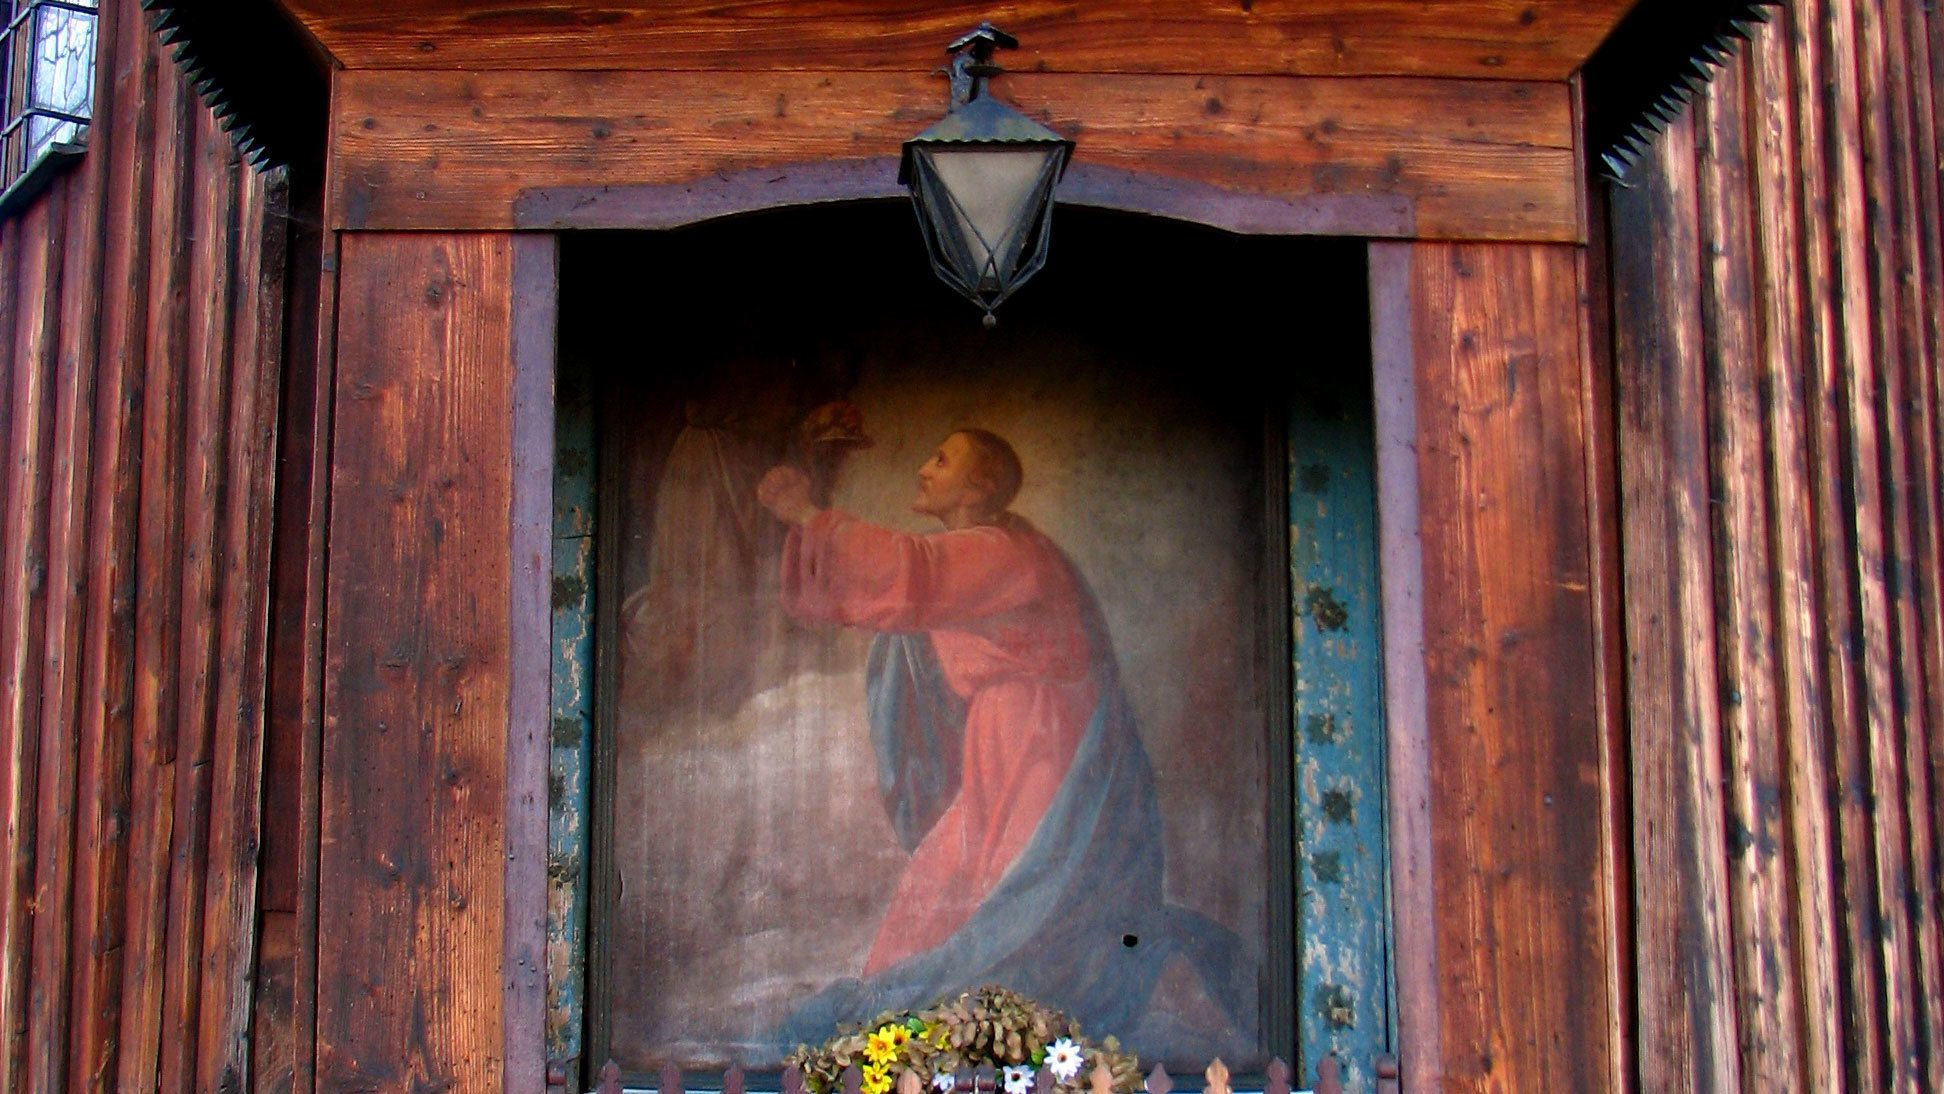 Portrait found at the Malopolska Region Wooden Architecture Tour in Poland